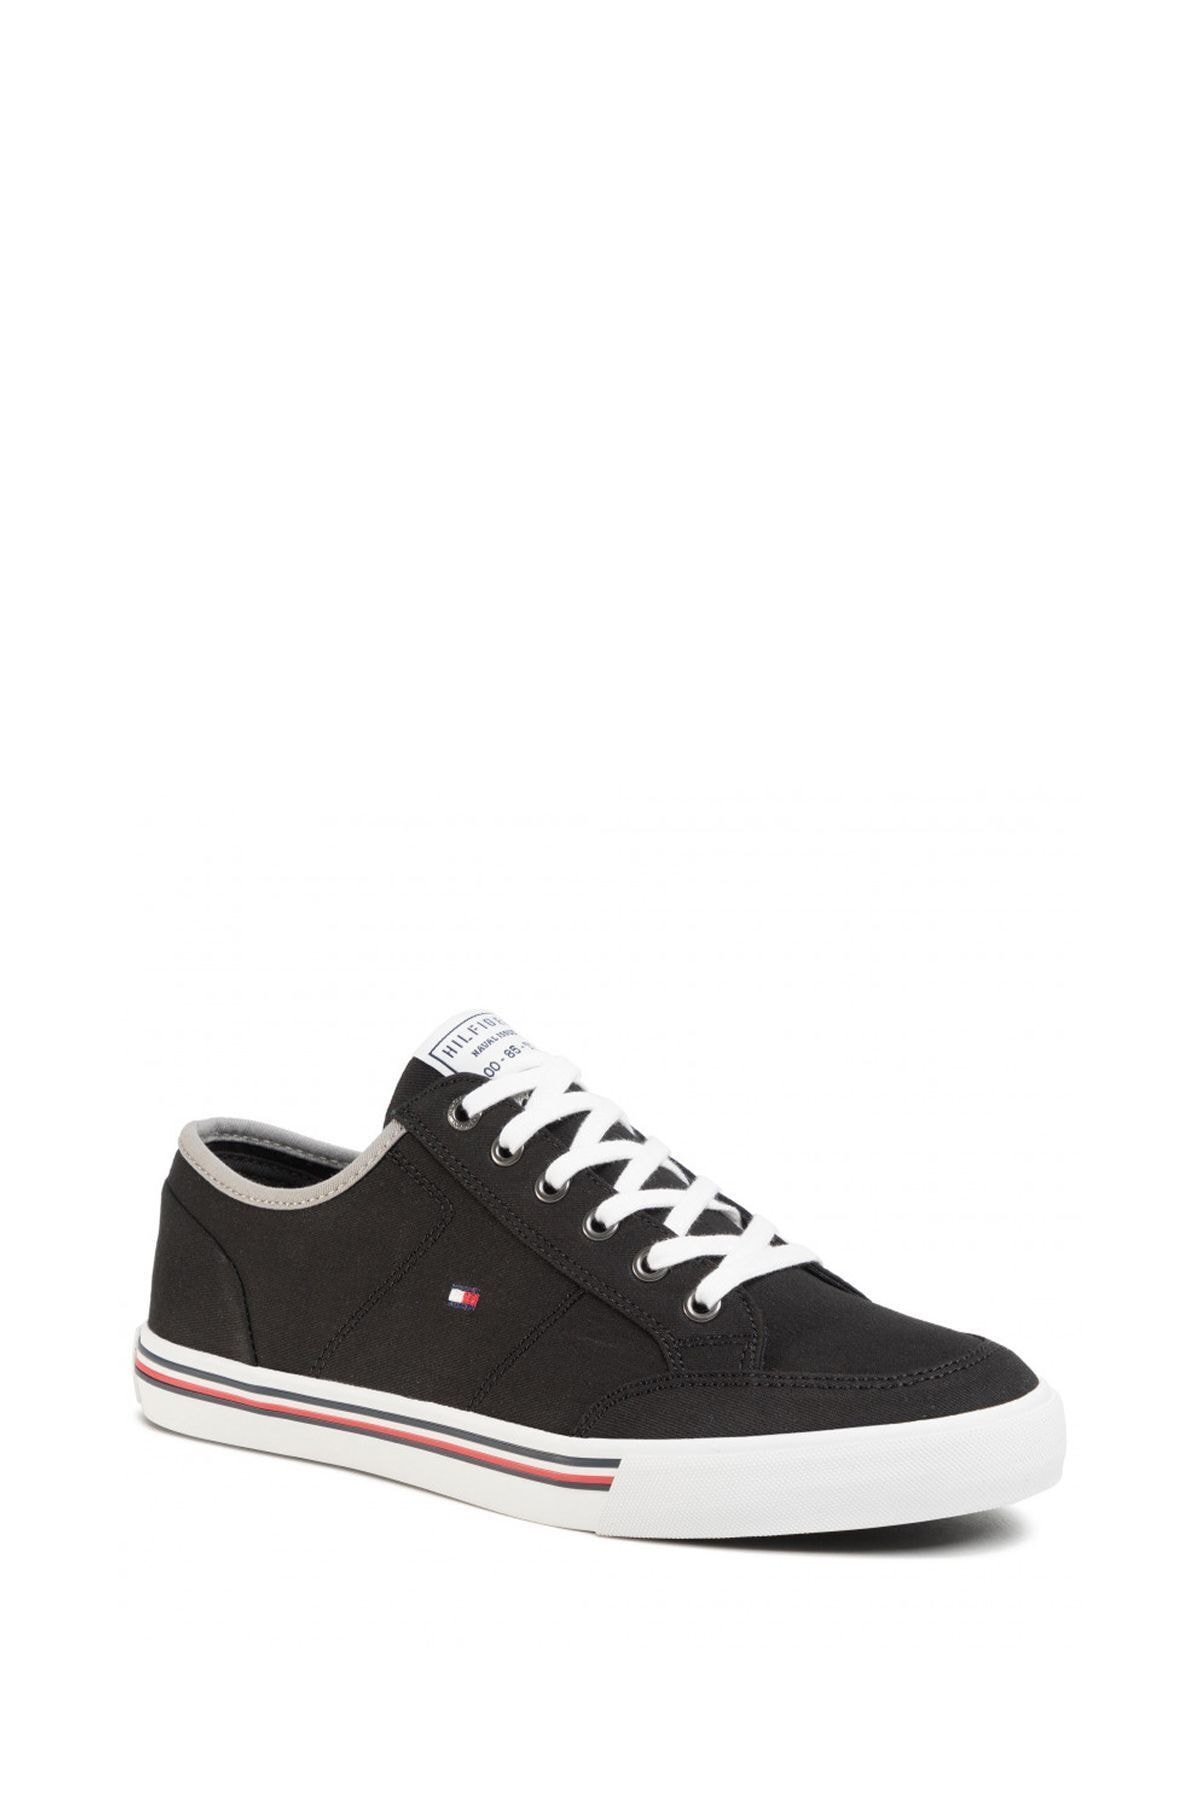 Tommy Hilfiger Erkek Core Corporate Textile Sneaker Erkek Ayakkabı Fm0fm02676 1